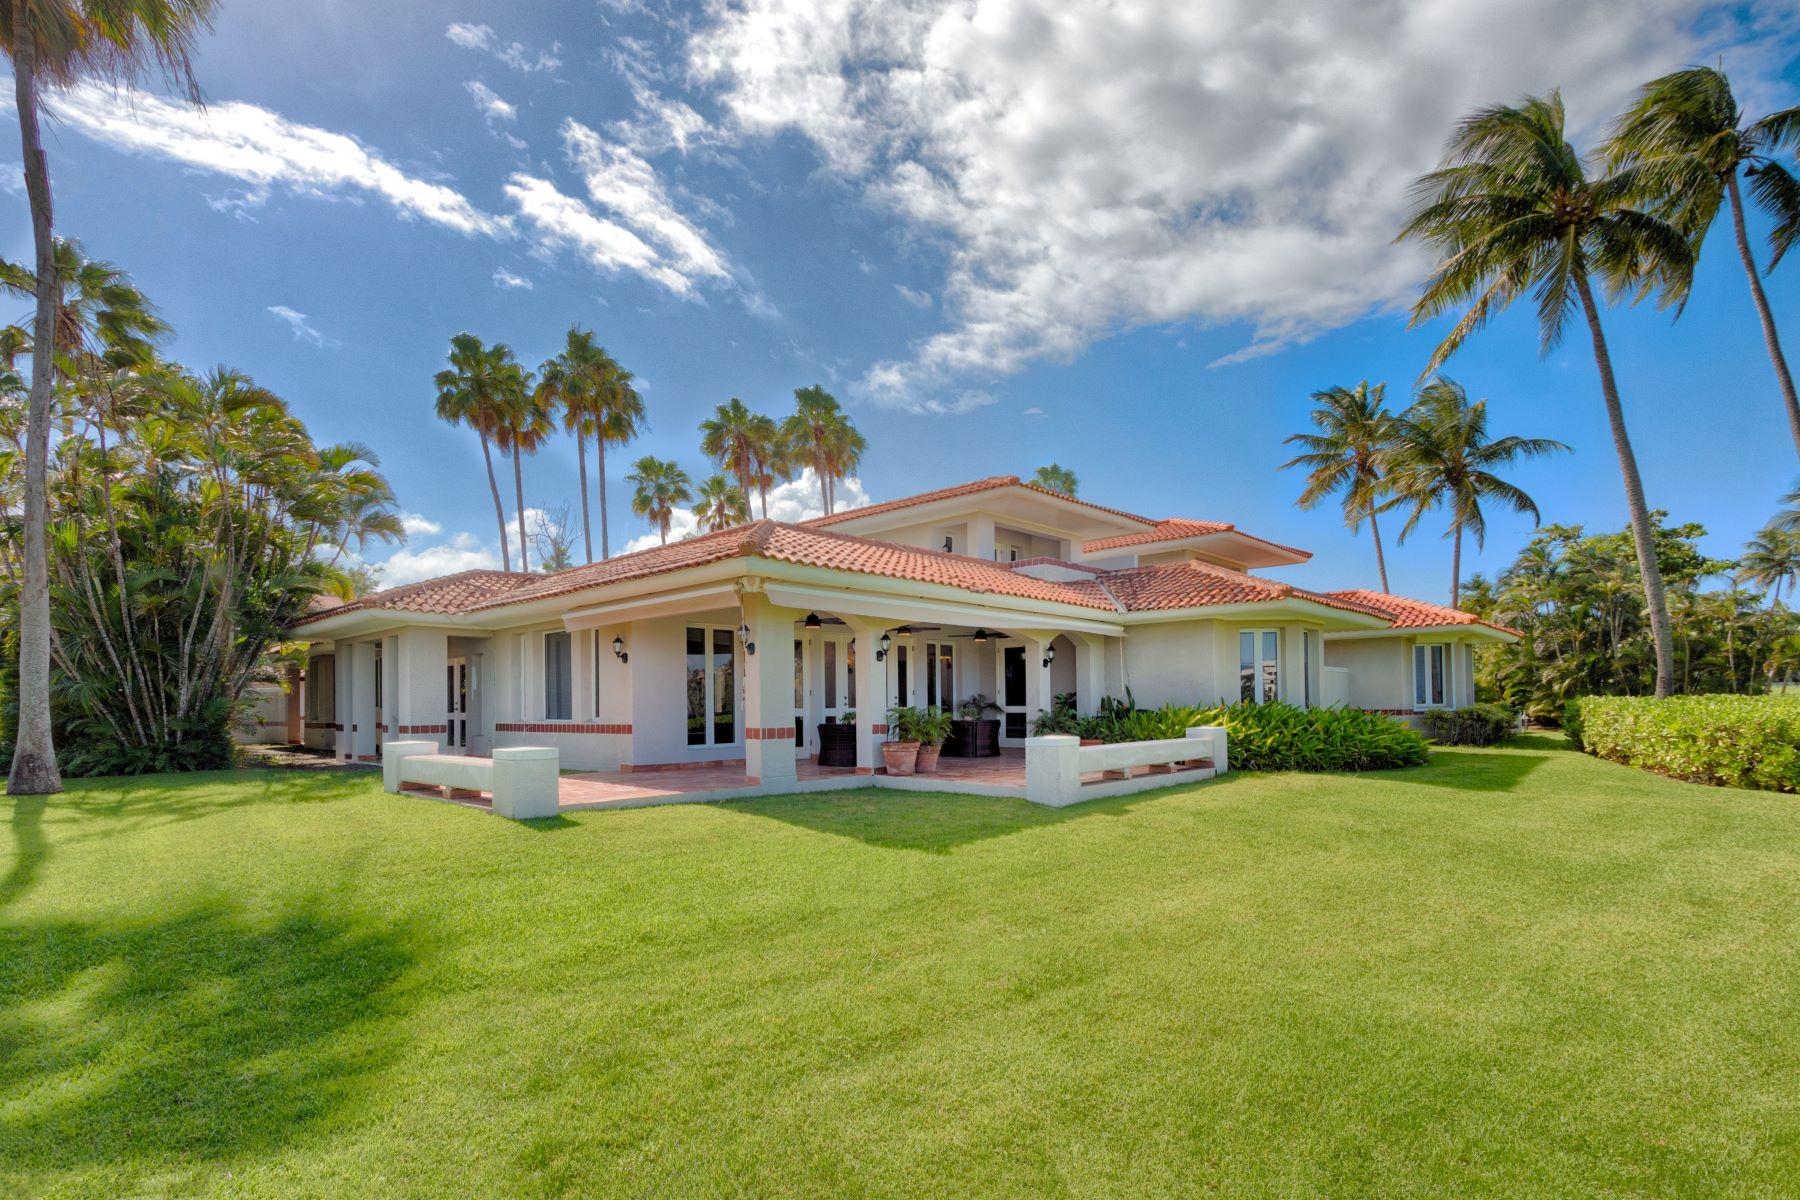 Apartment for Sale at Perfect Caribbean Home 100 The Greens Villas Drive, Villa 2 Dorado Beach, 00646 Puerto Rico